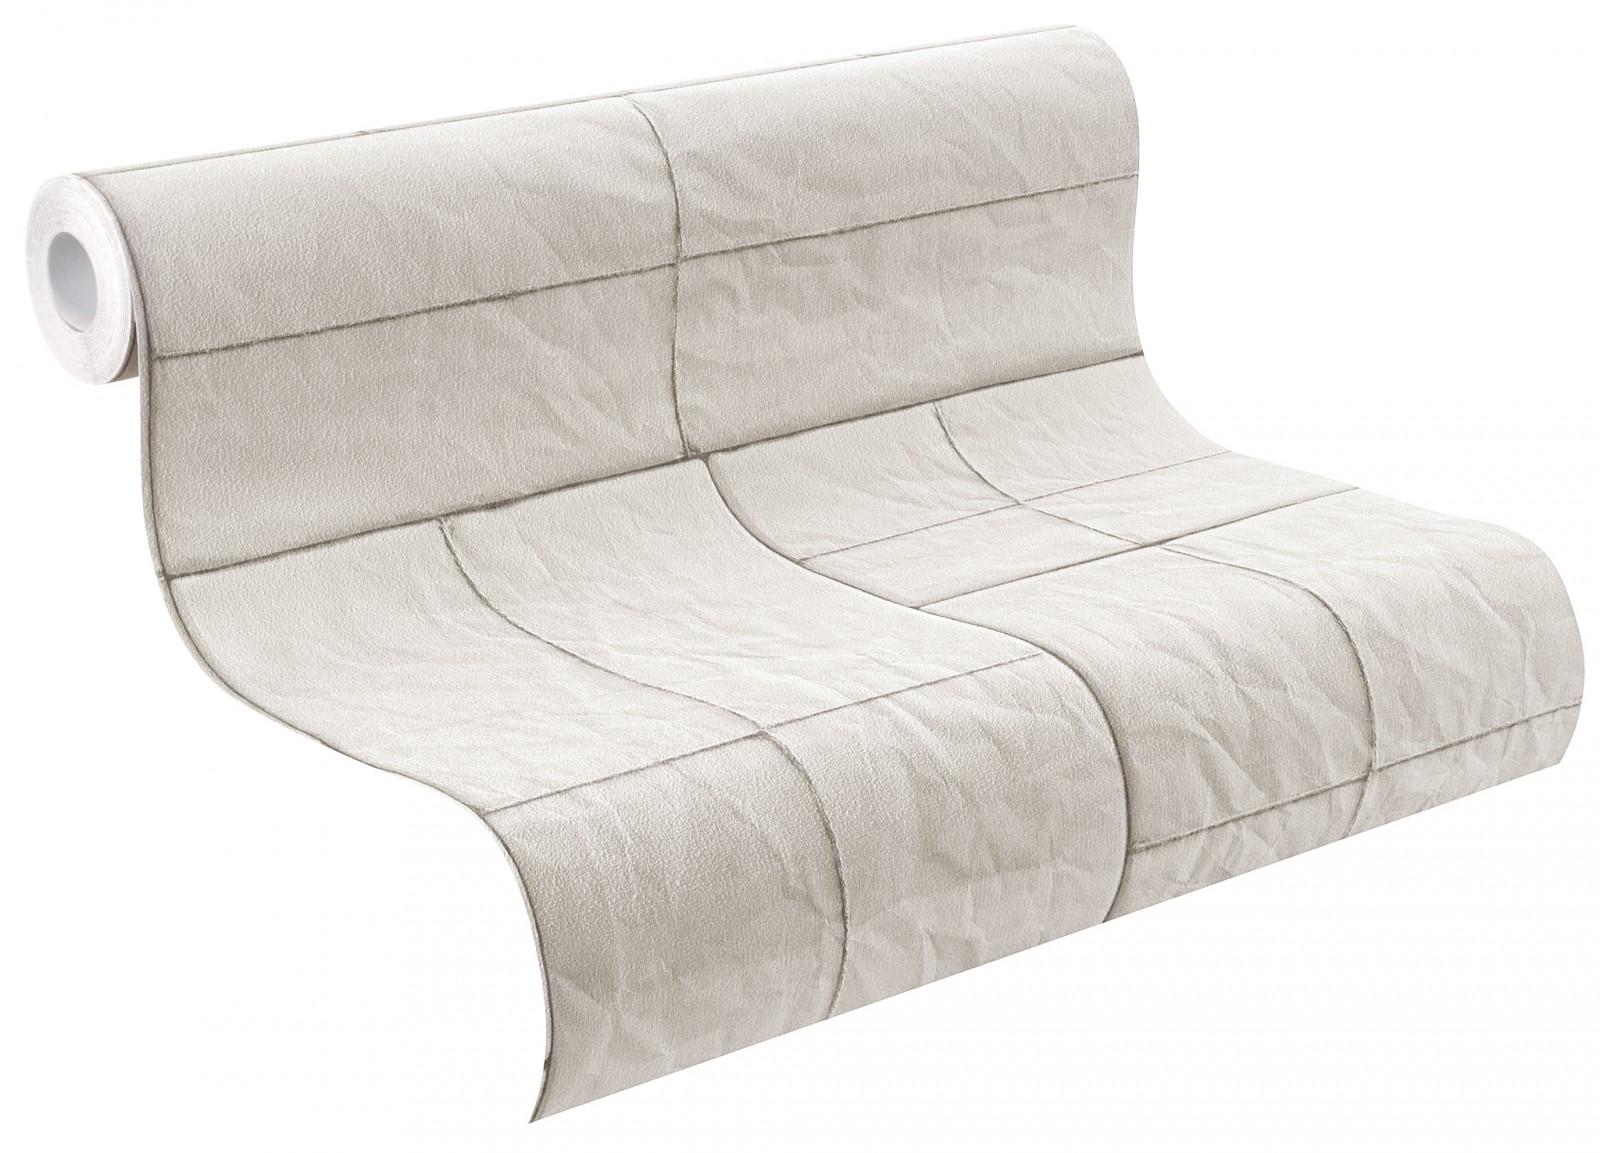 tapete rasch crispy paper fliesen grau wei 524307. Black Bedroom Furniture Sets. Home Design Ideas